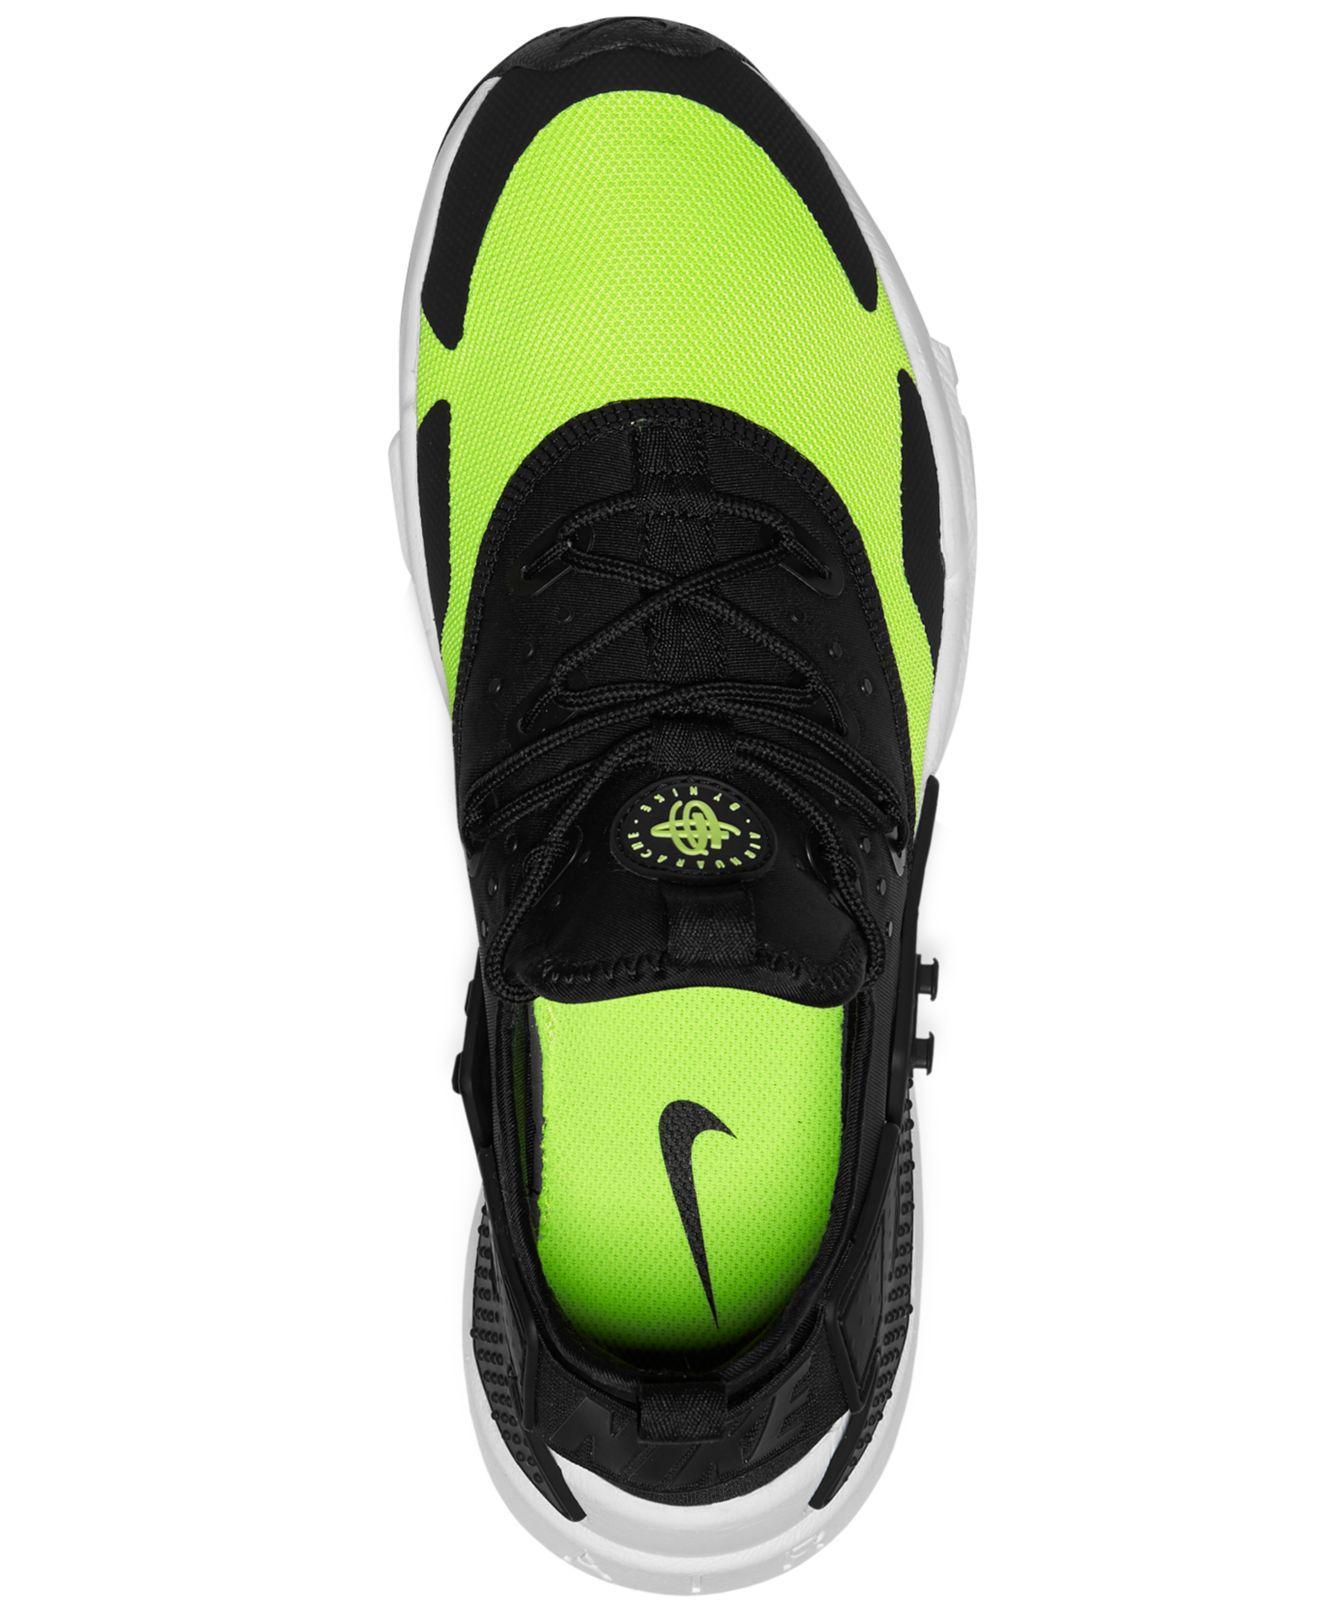 2741a827b531b Gallery. Previously sold at  Macy s · Men s Running Sneakers Men s Nike  Huarache Men s Nike Air ...